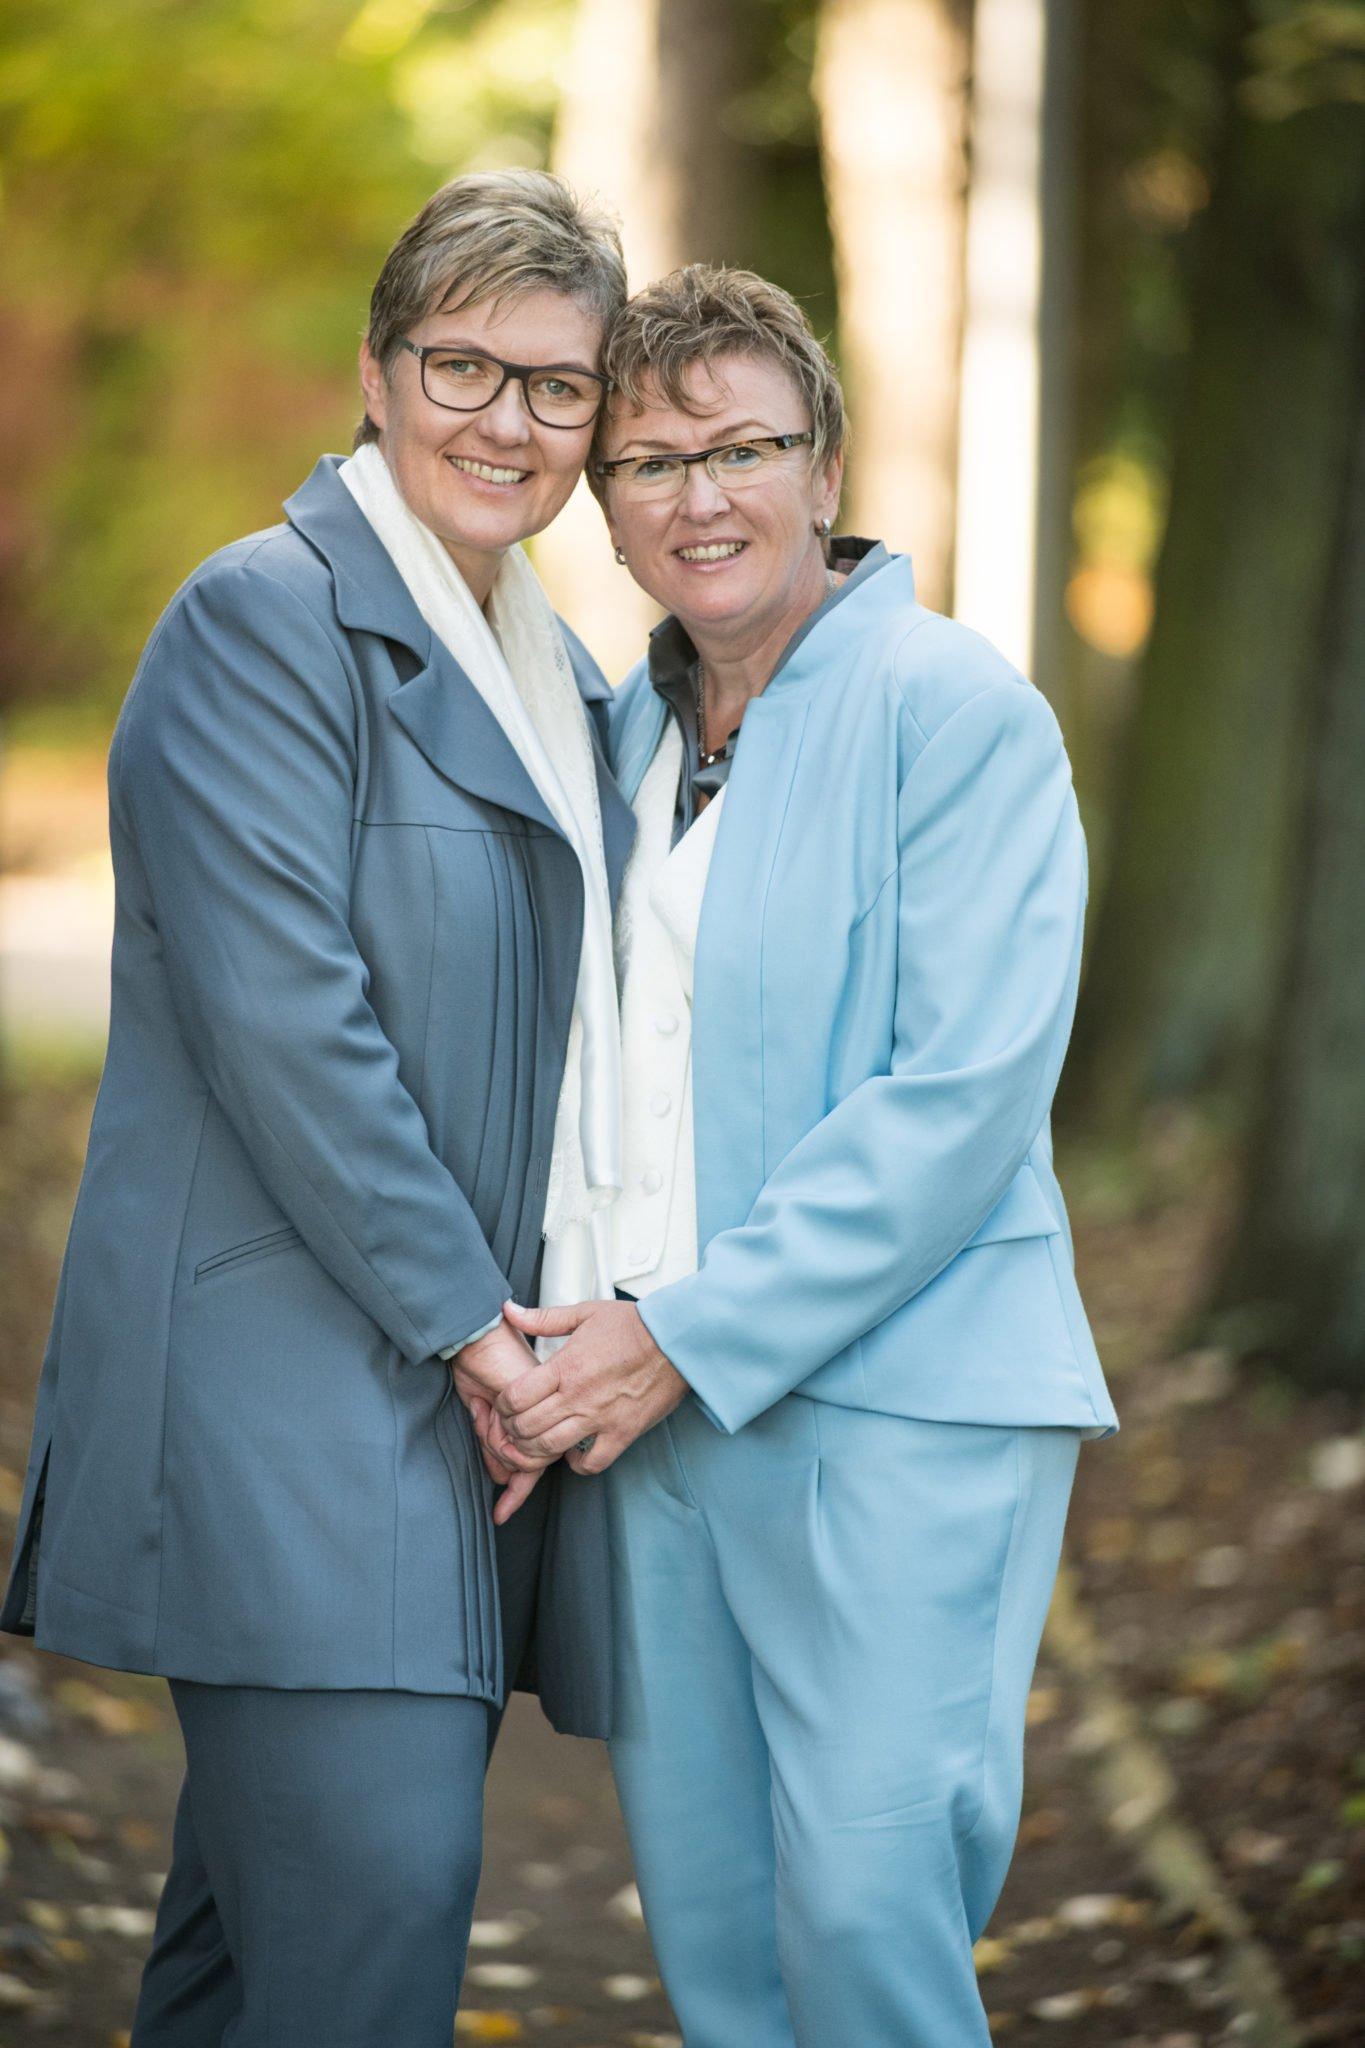 Claudia-und-Cordula-Hochzeit_2017-10-14_D850_0650